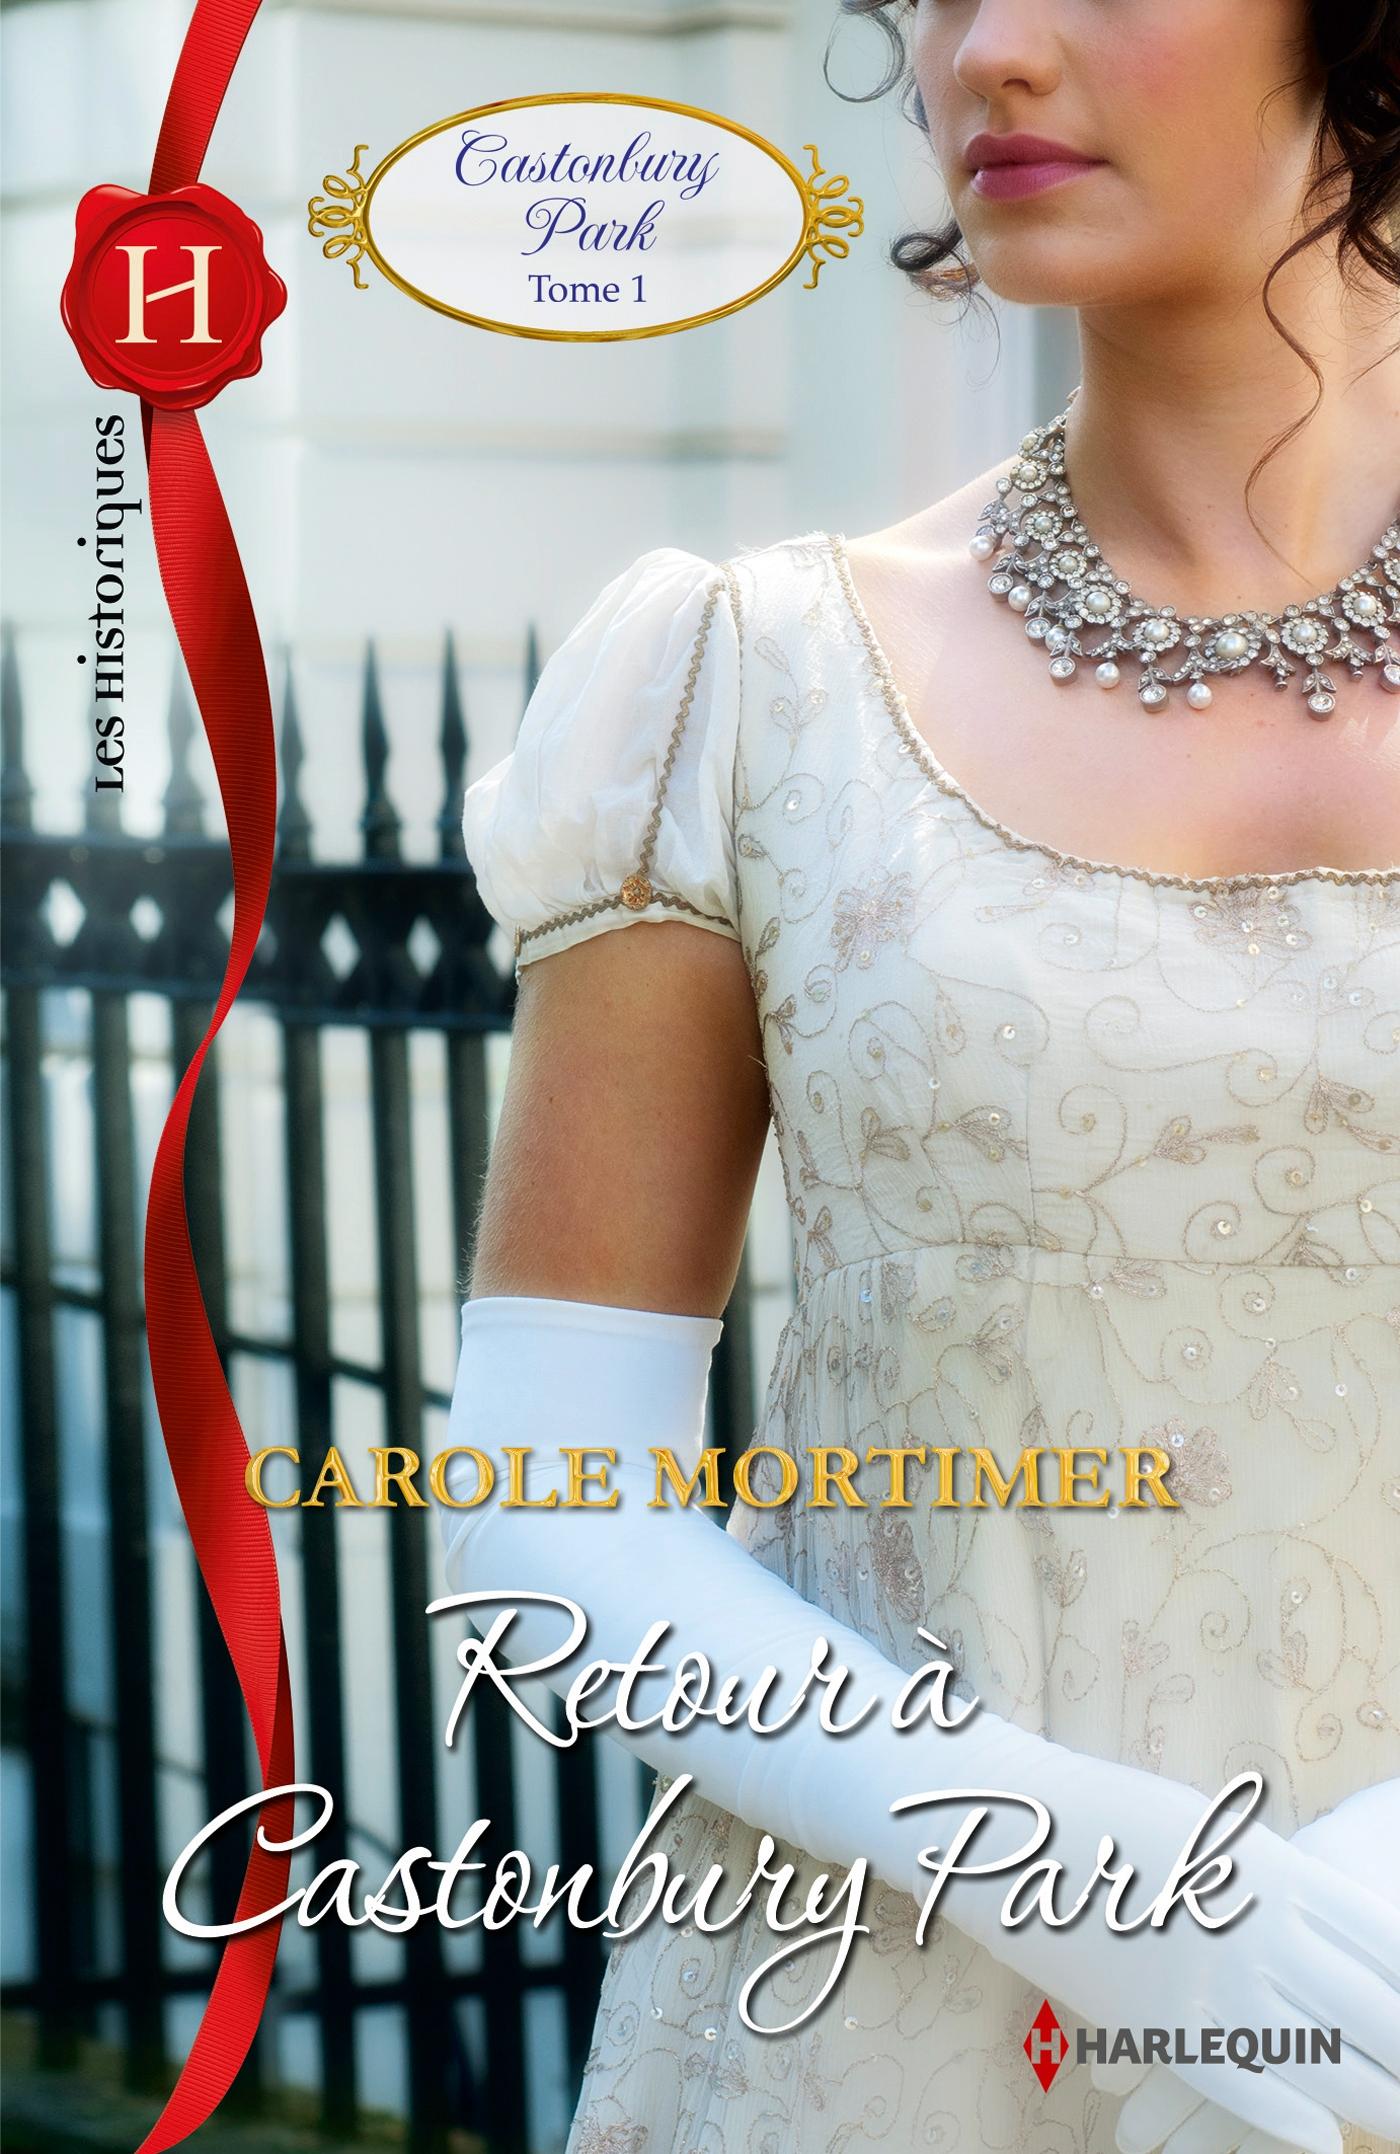 Castonbury Park - Tome 1 : Retour à Castonbury Park  de Carole Mortimer 9782280311755